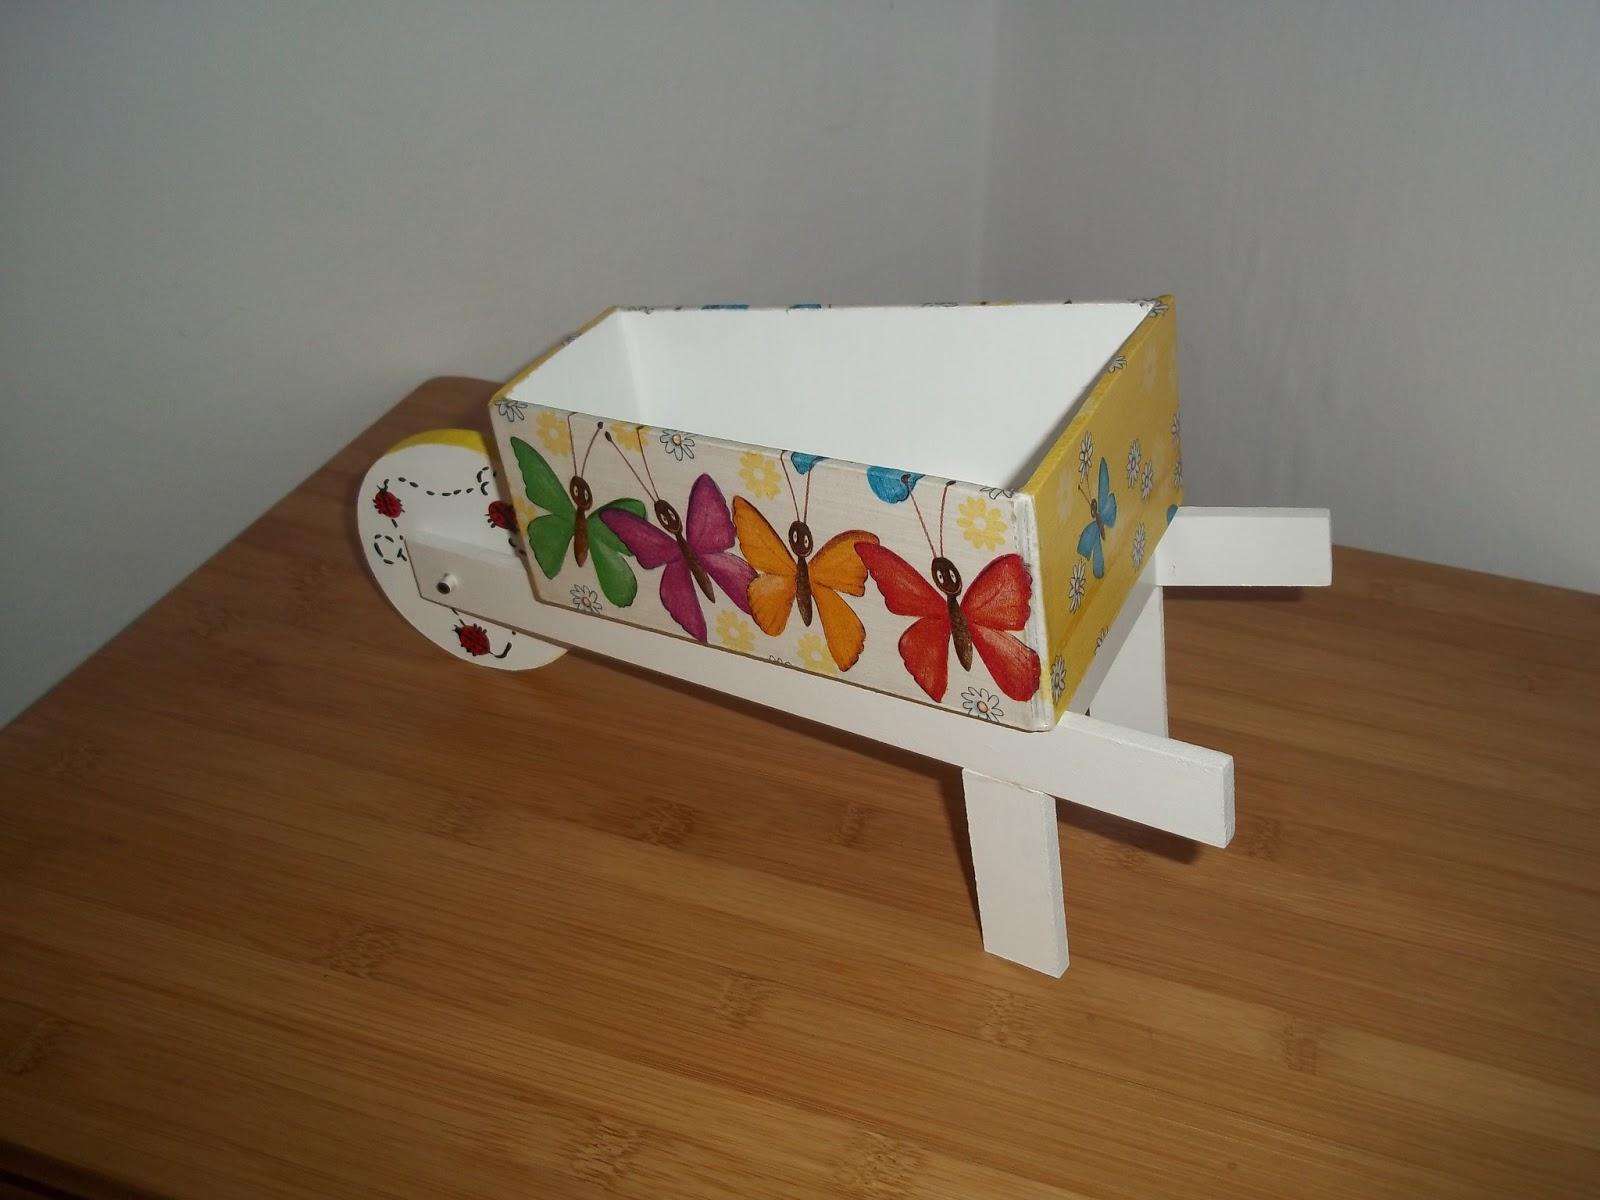 Articulos en fibrofacil carretilla porta objetos decoracion - Objetos decoracion ...